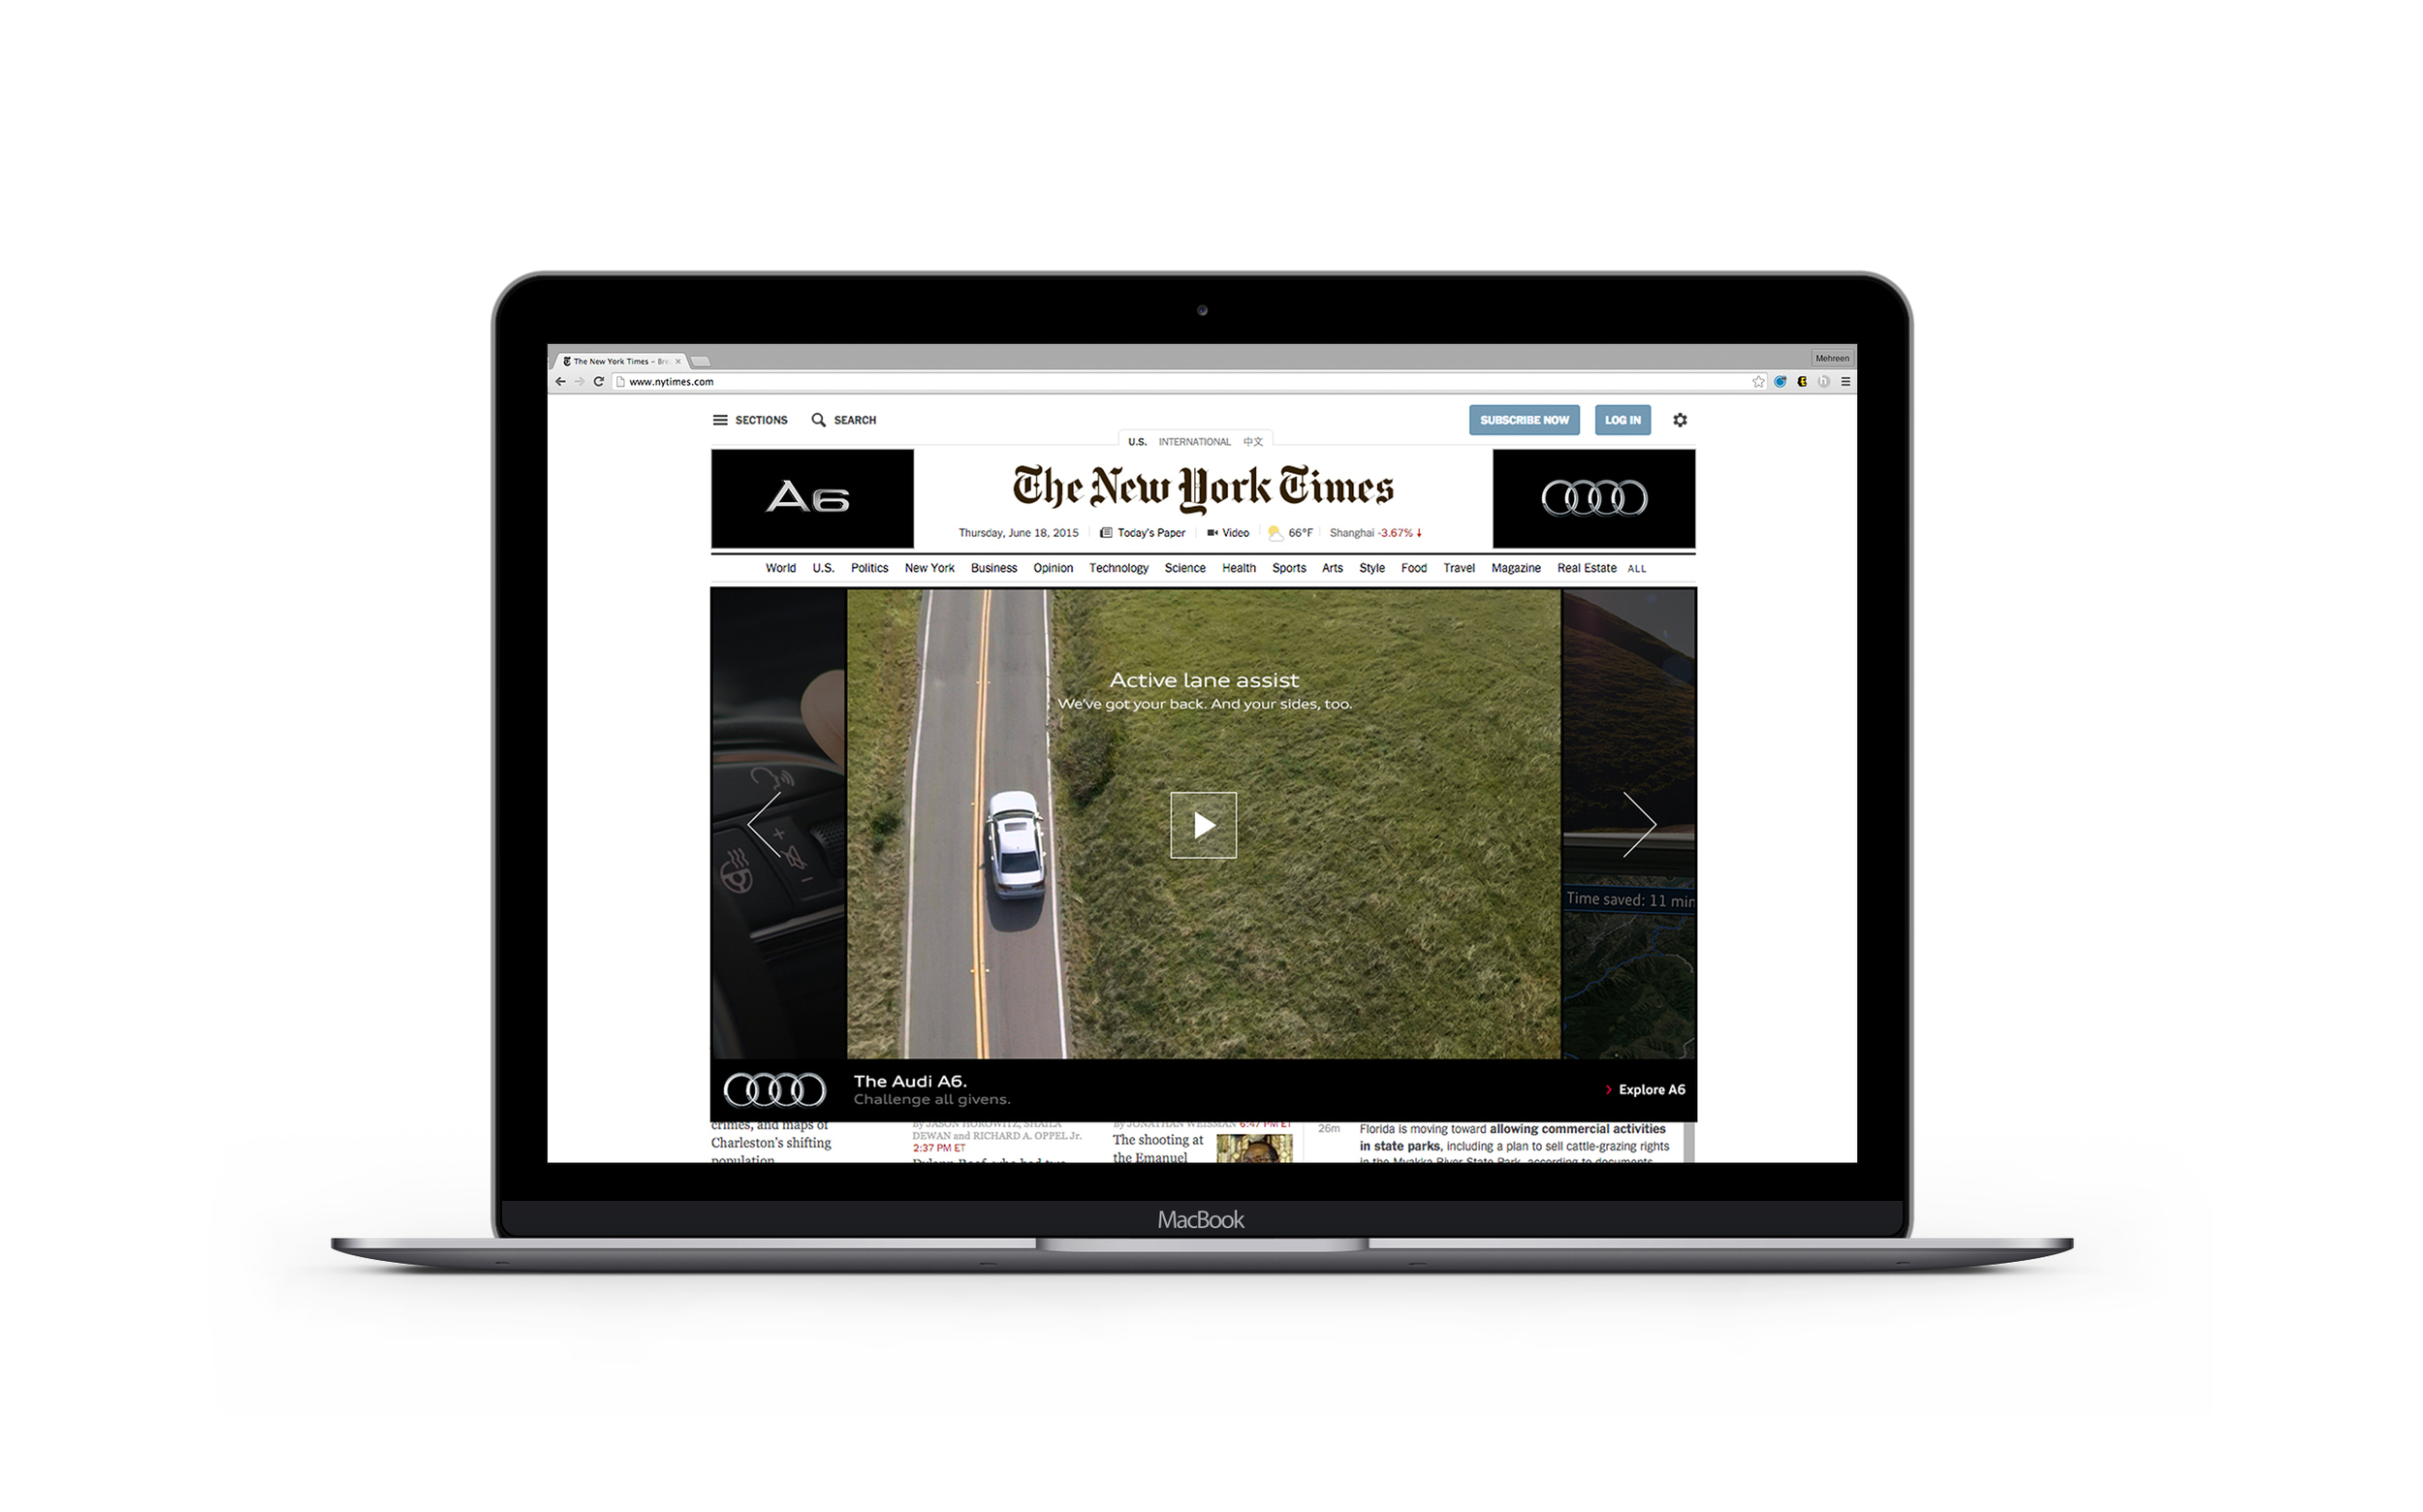 001-MacBook-Silver+active.jpg